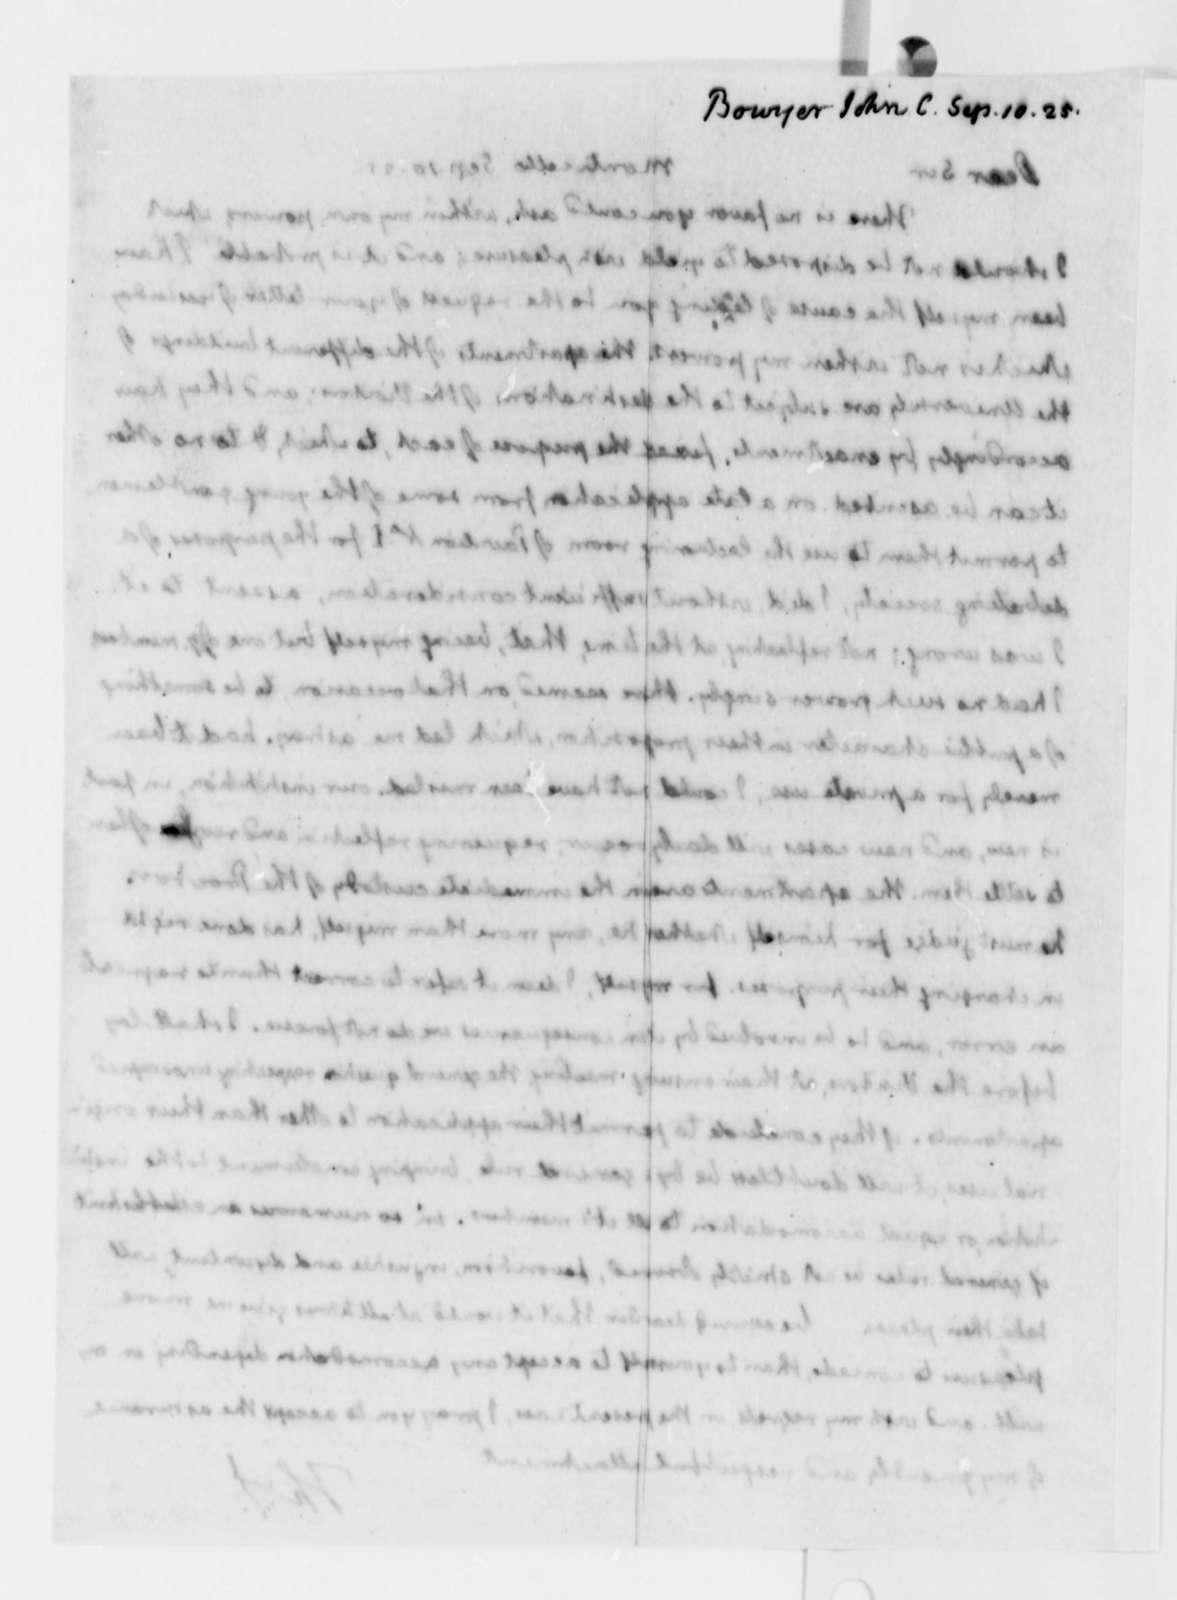 Thomas Jefferson to John C. Bowyer, September 10, 1825